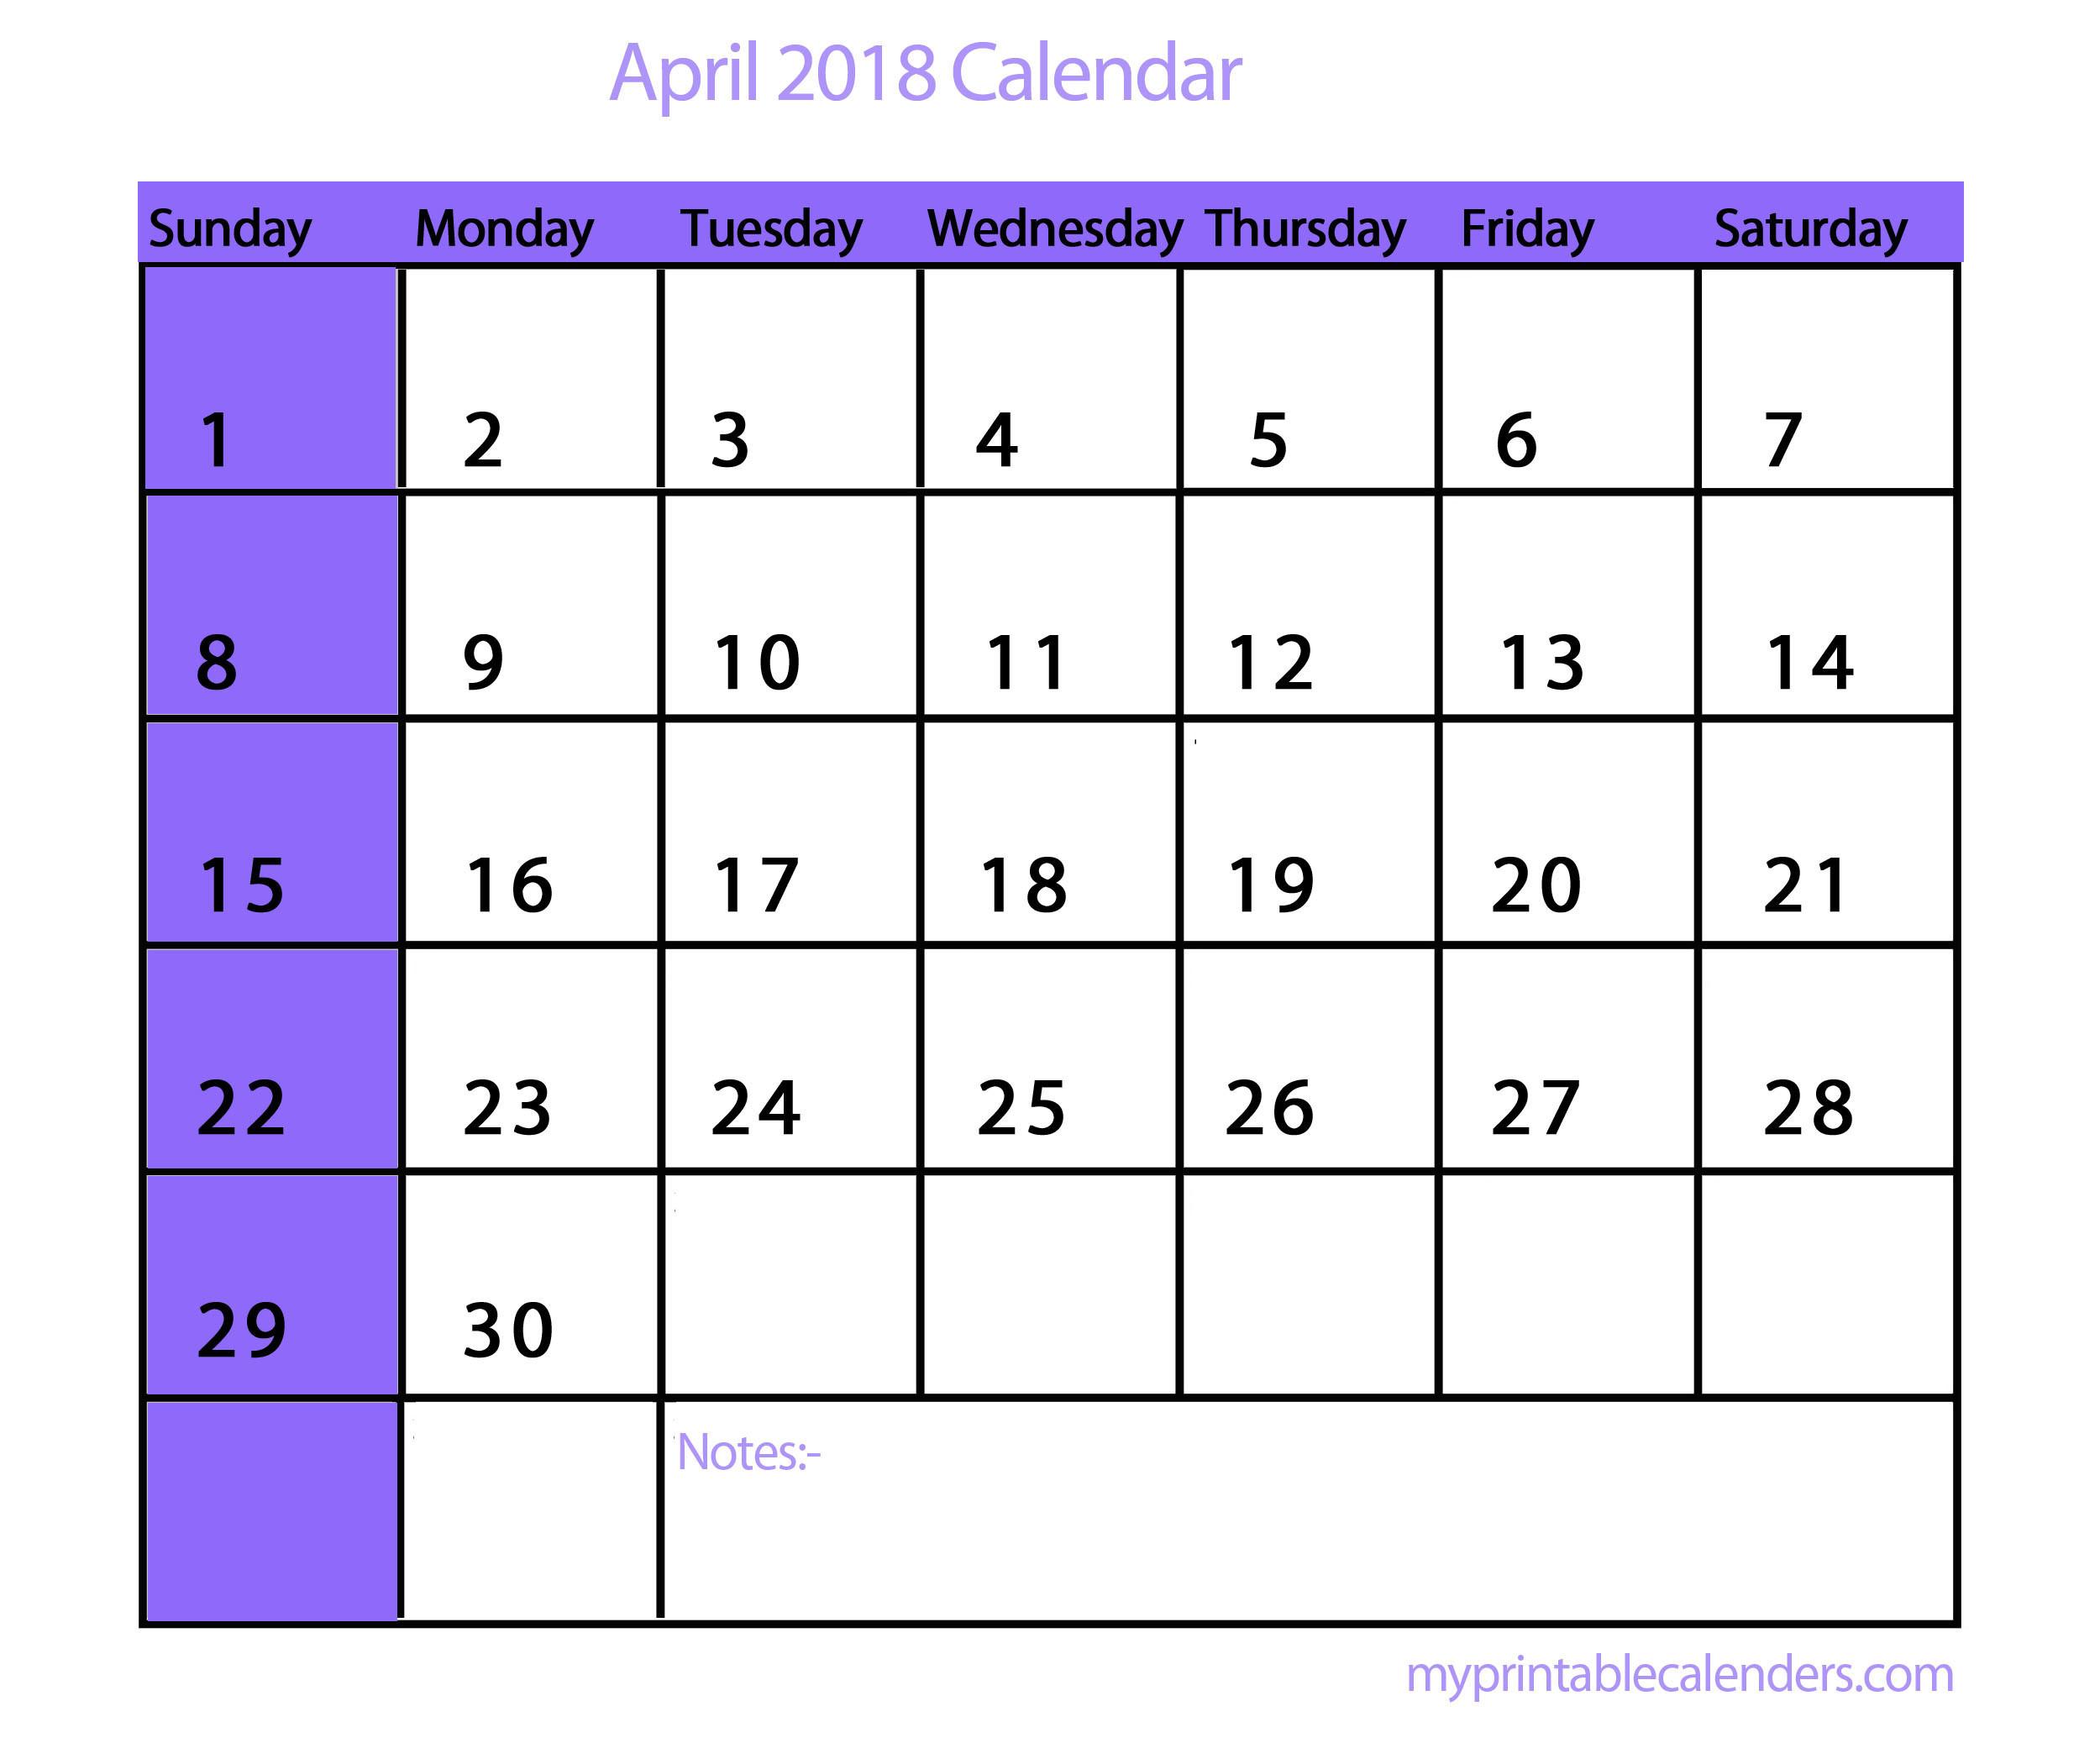 Calendar Wallpaper With Notes : Desktop wallpapers calendar april ·①